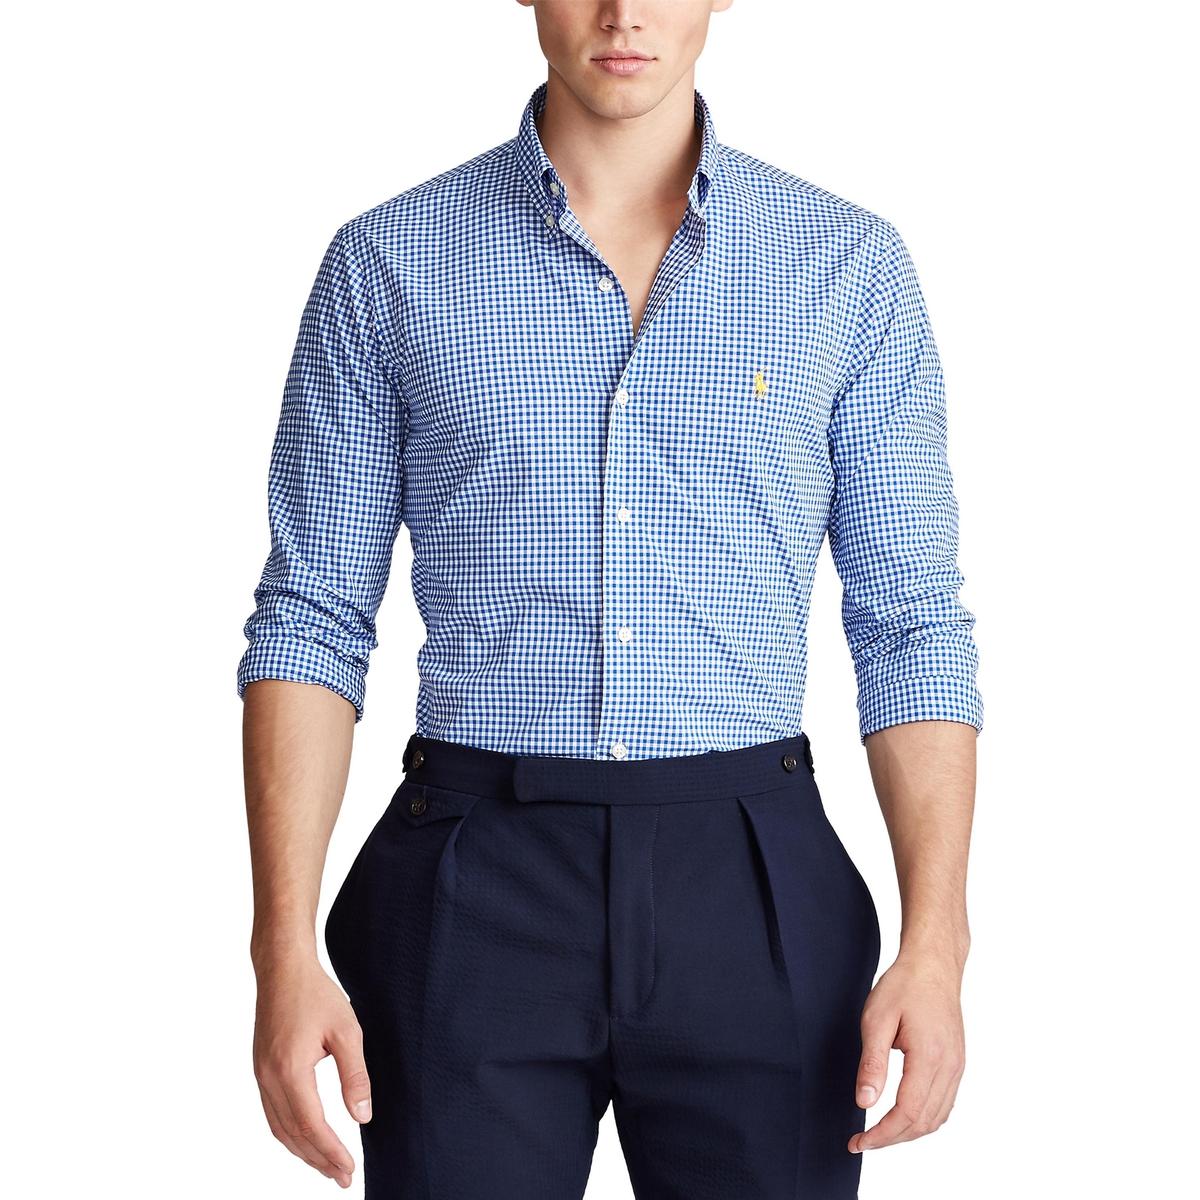 Рубашка La Redoute Узкого покроя в клетку из поплина XL синий